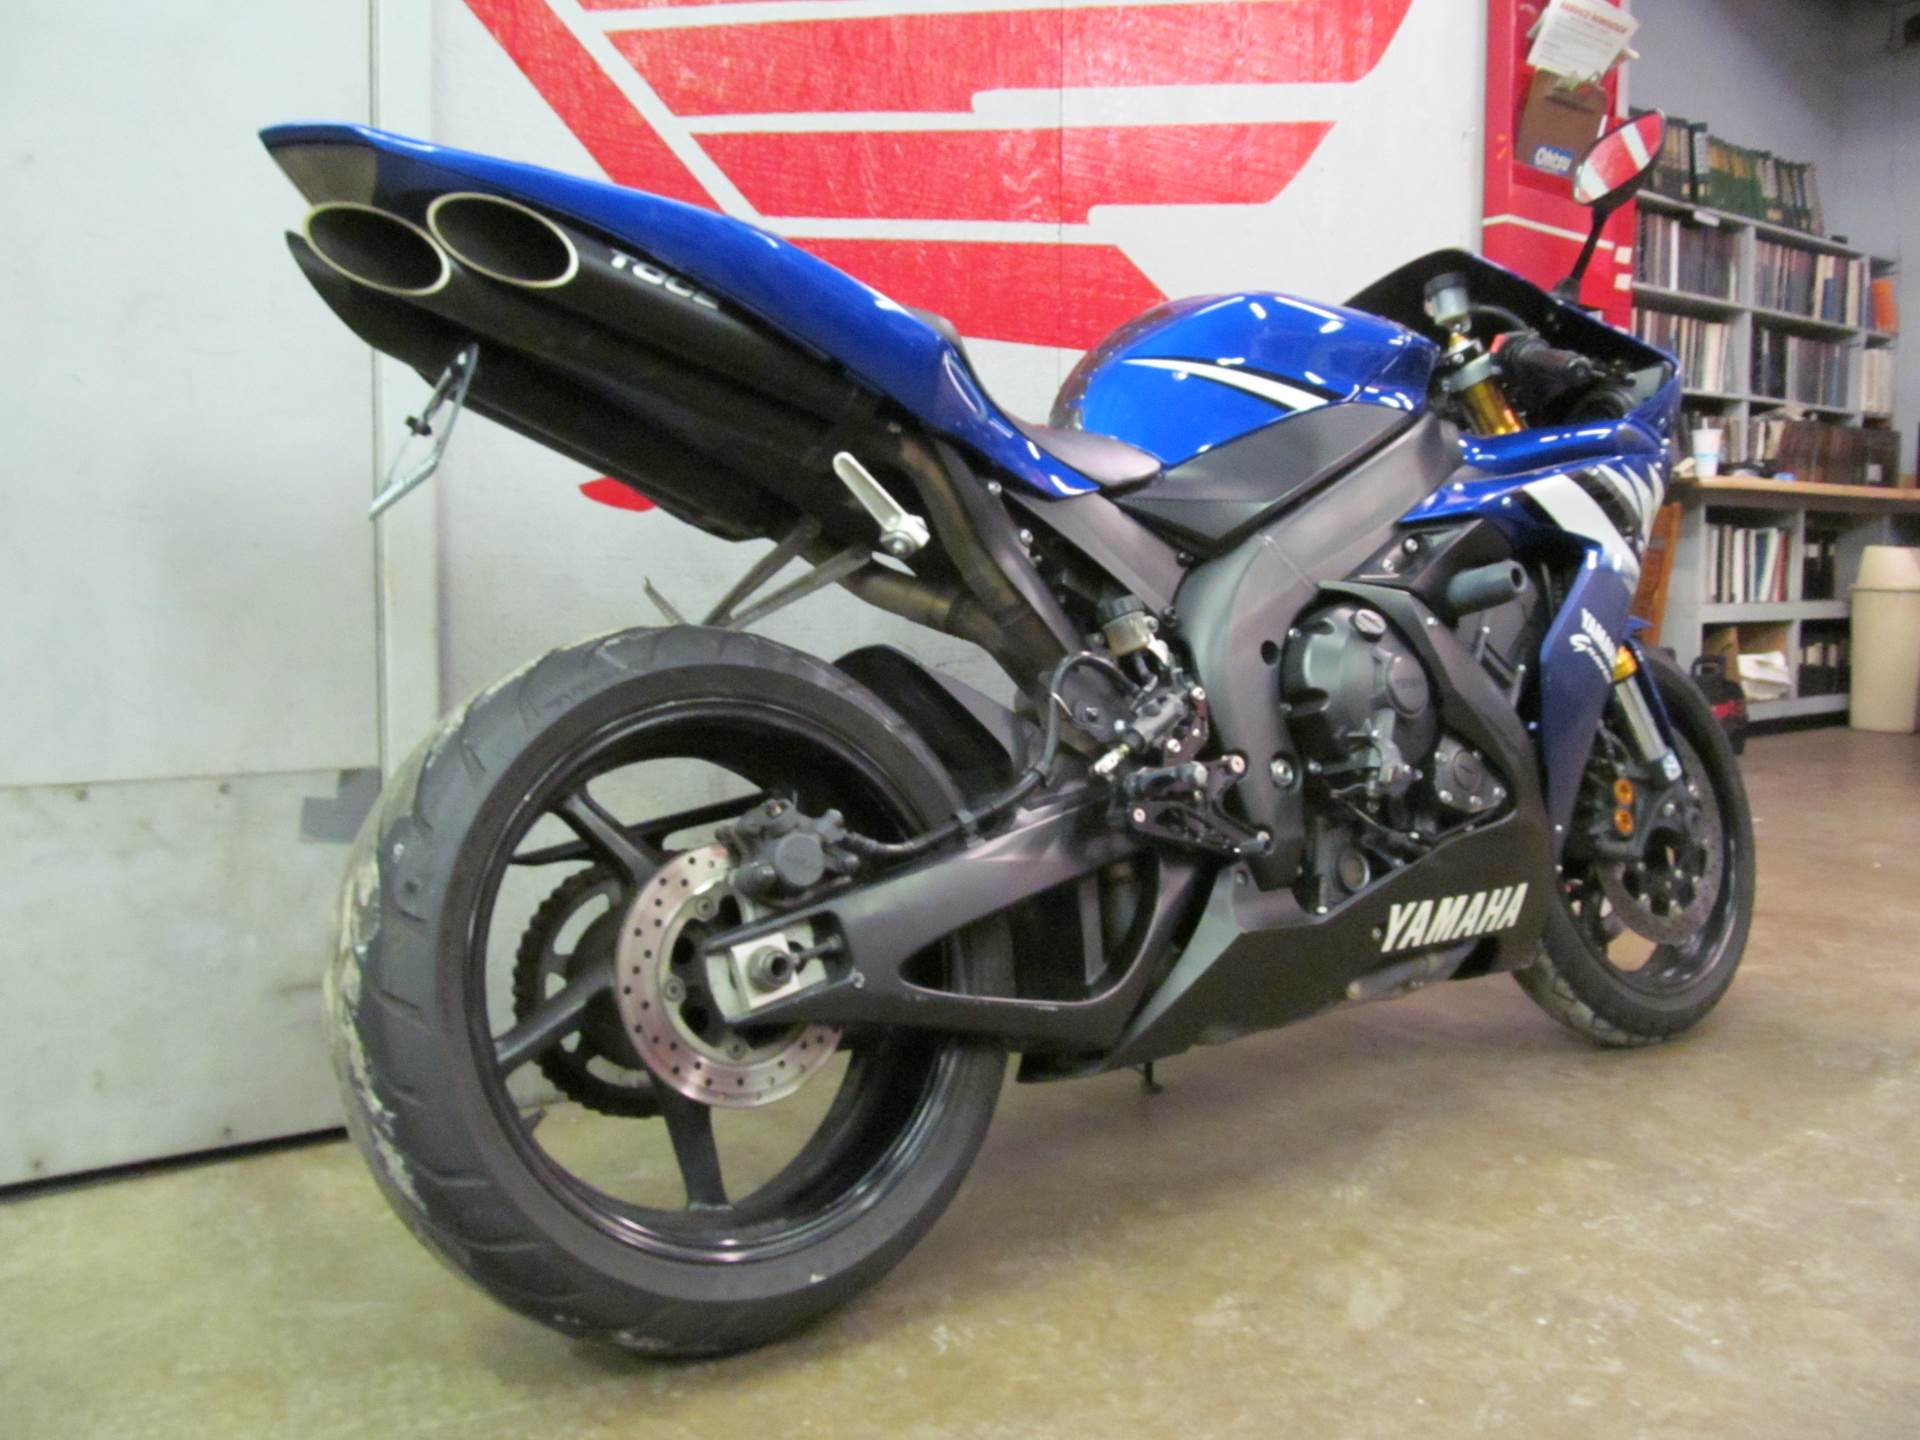 2006 Yamaha YZF-R1 5